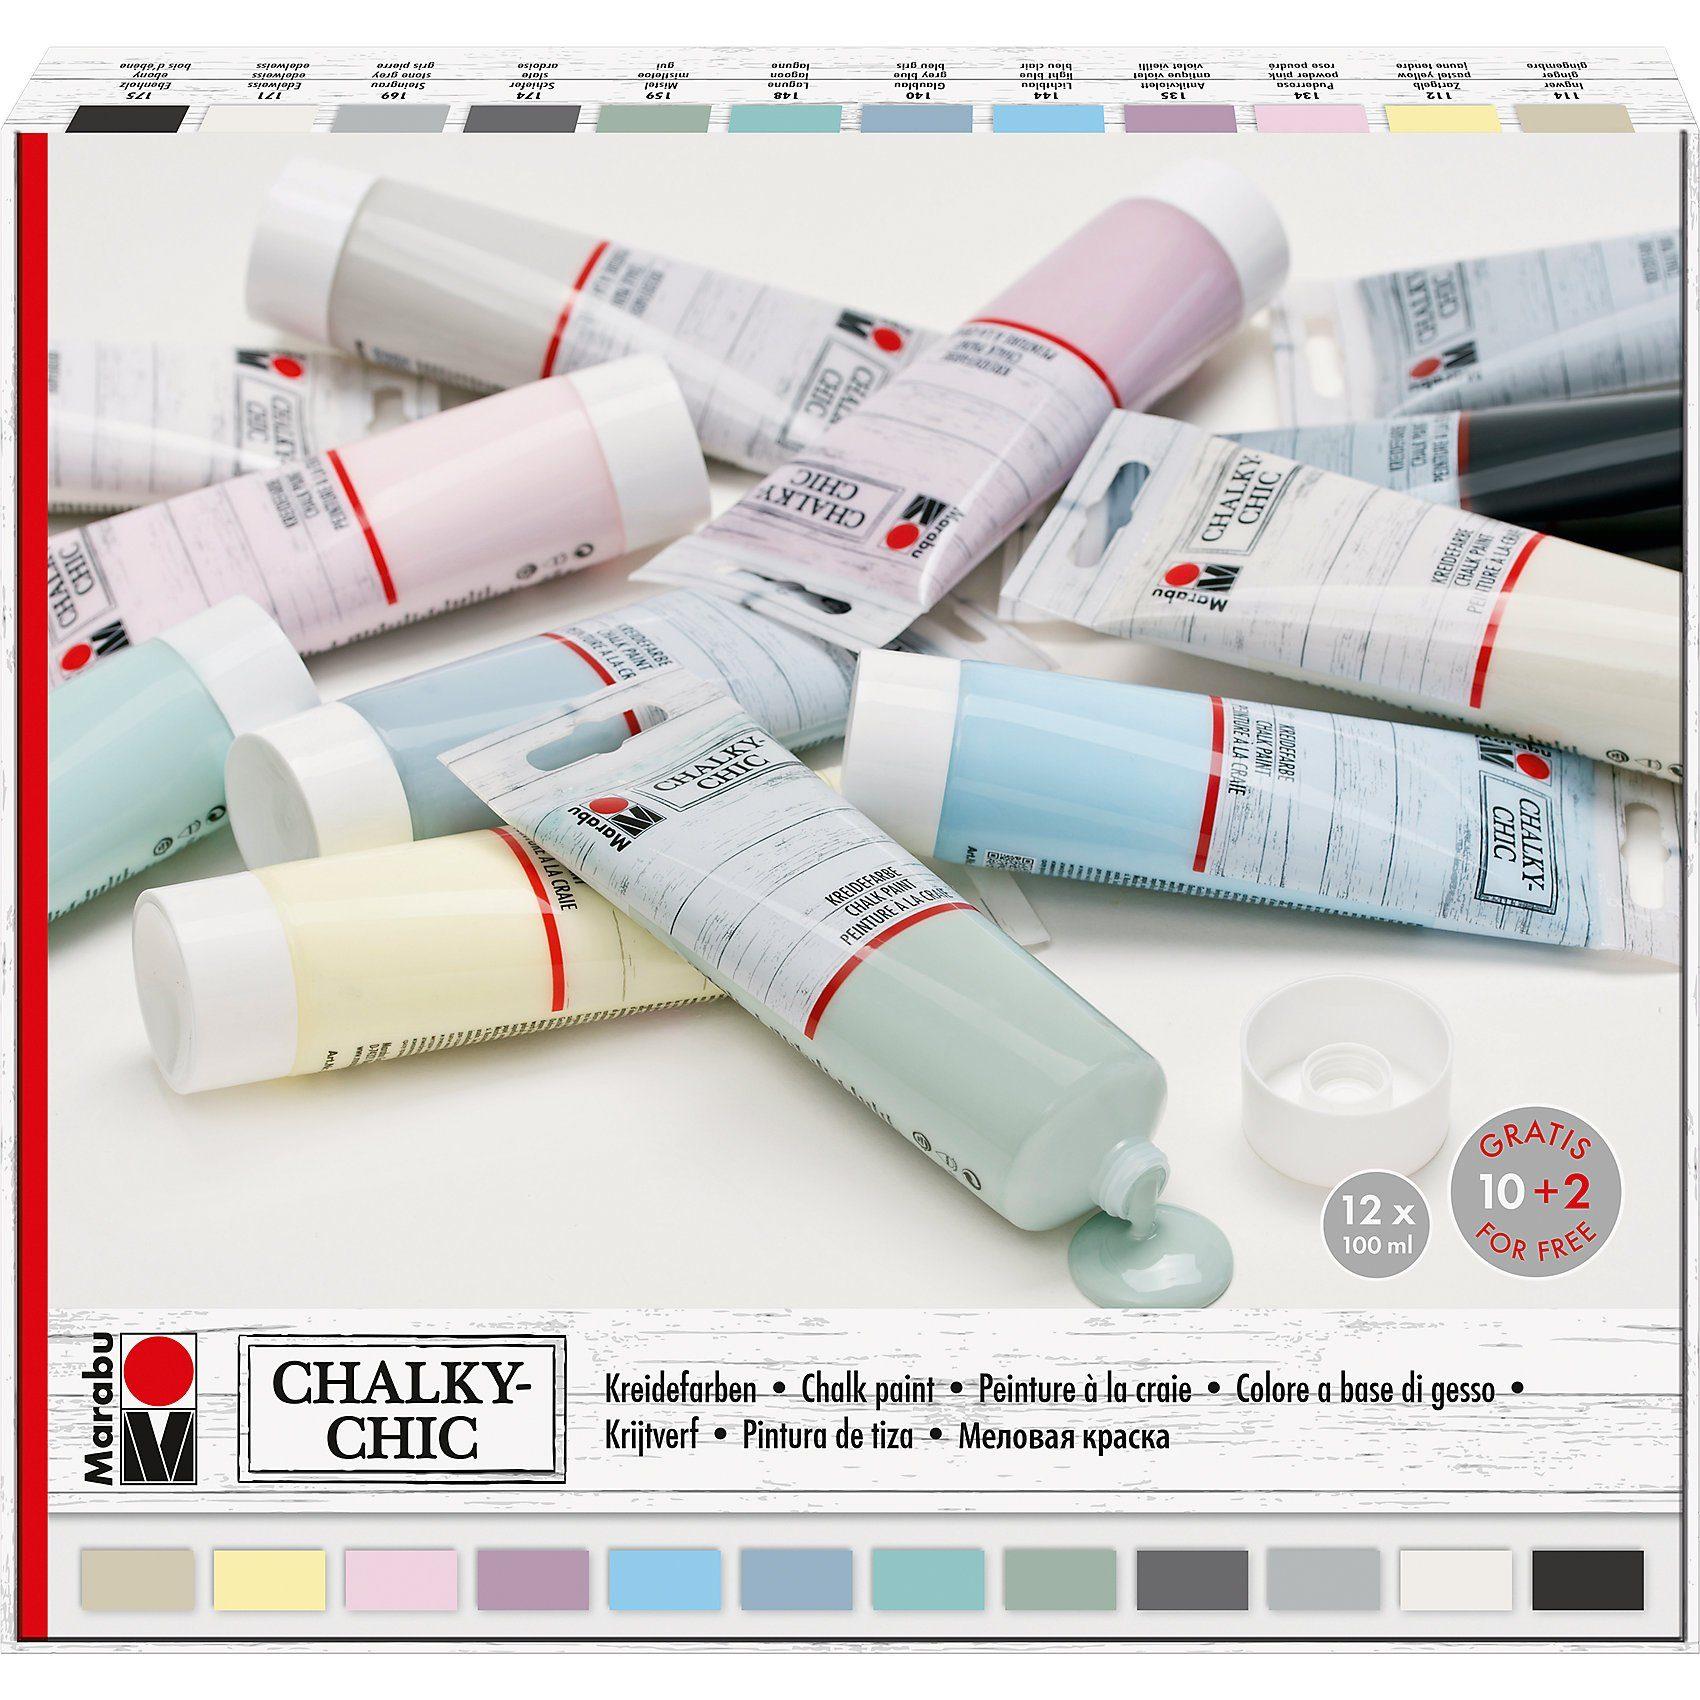 Marabu Kreidefarben Chalky Chic, 12 x 100 ml